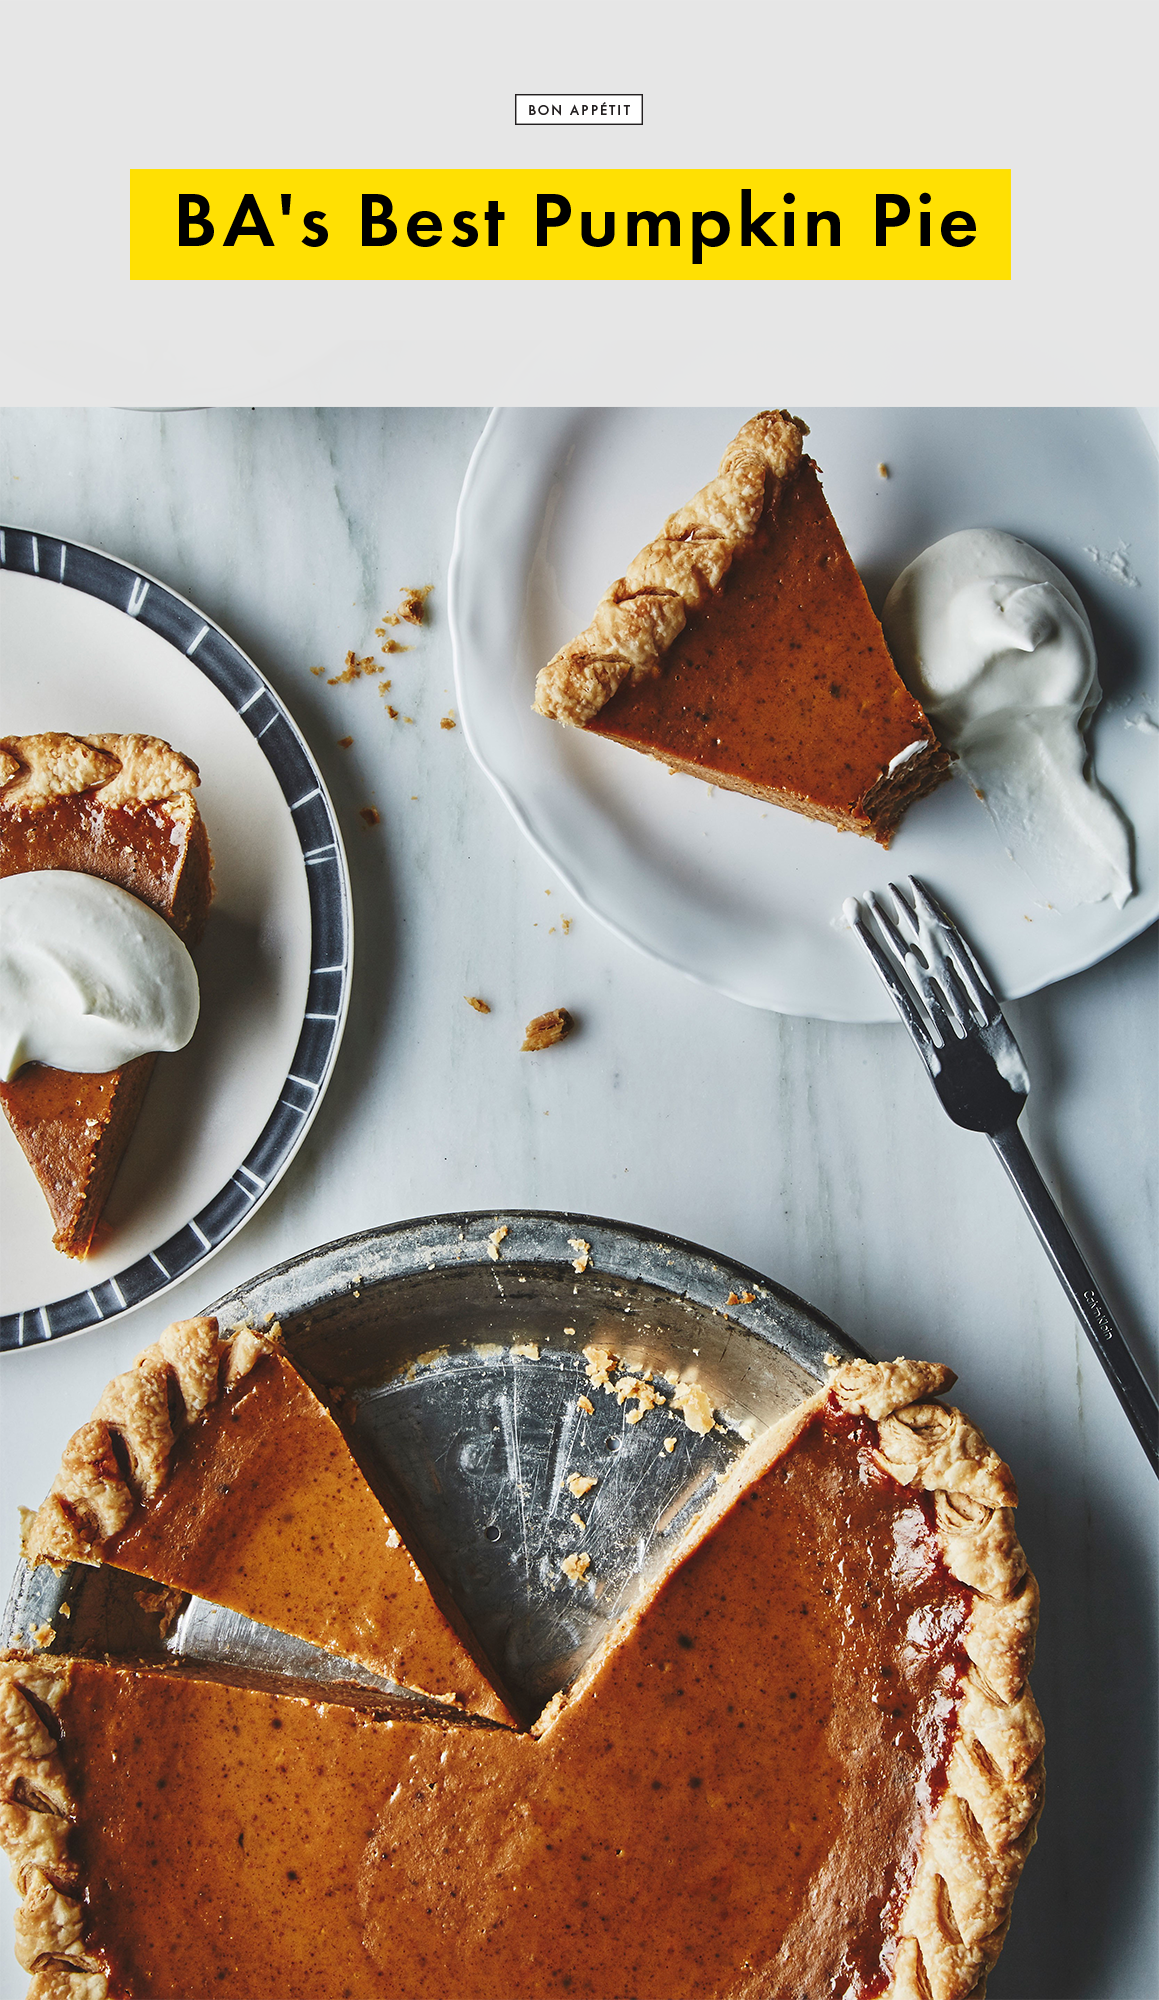 Ba S Best Pumpkin Pie Recipe Recipe Best Pumpkin Pie Pumpkin Pie Recipes Best Pumpkin Pie Recipe